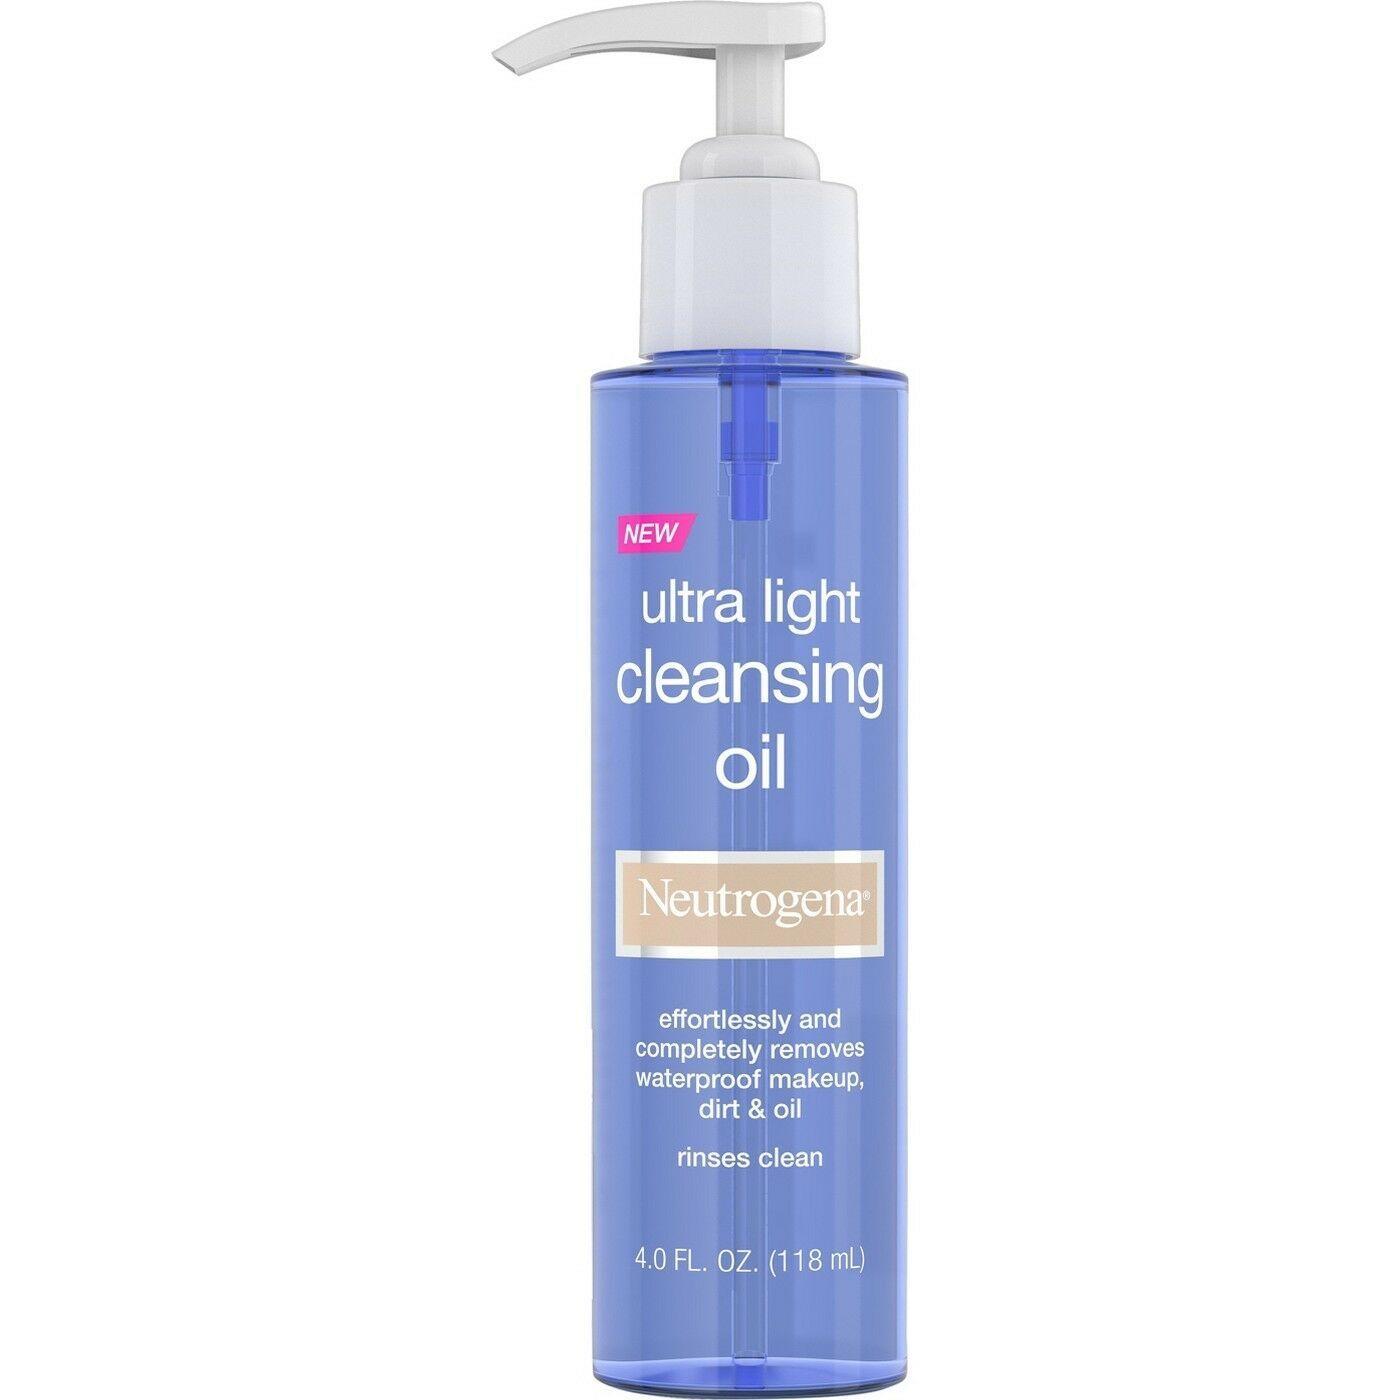 Neutrogena Cleansing Oil 4 fl oz. - $10.99